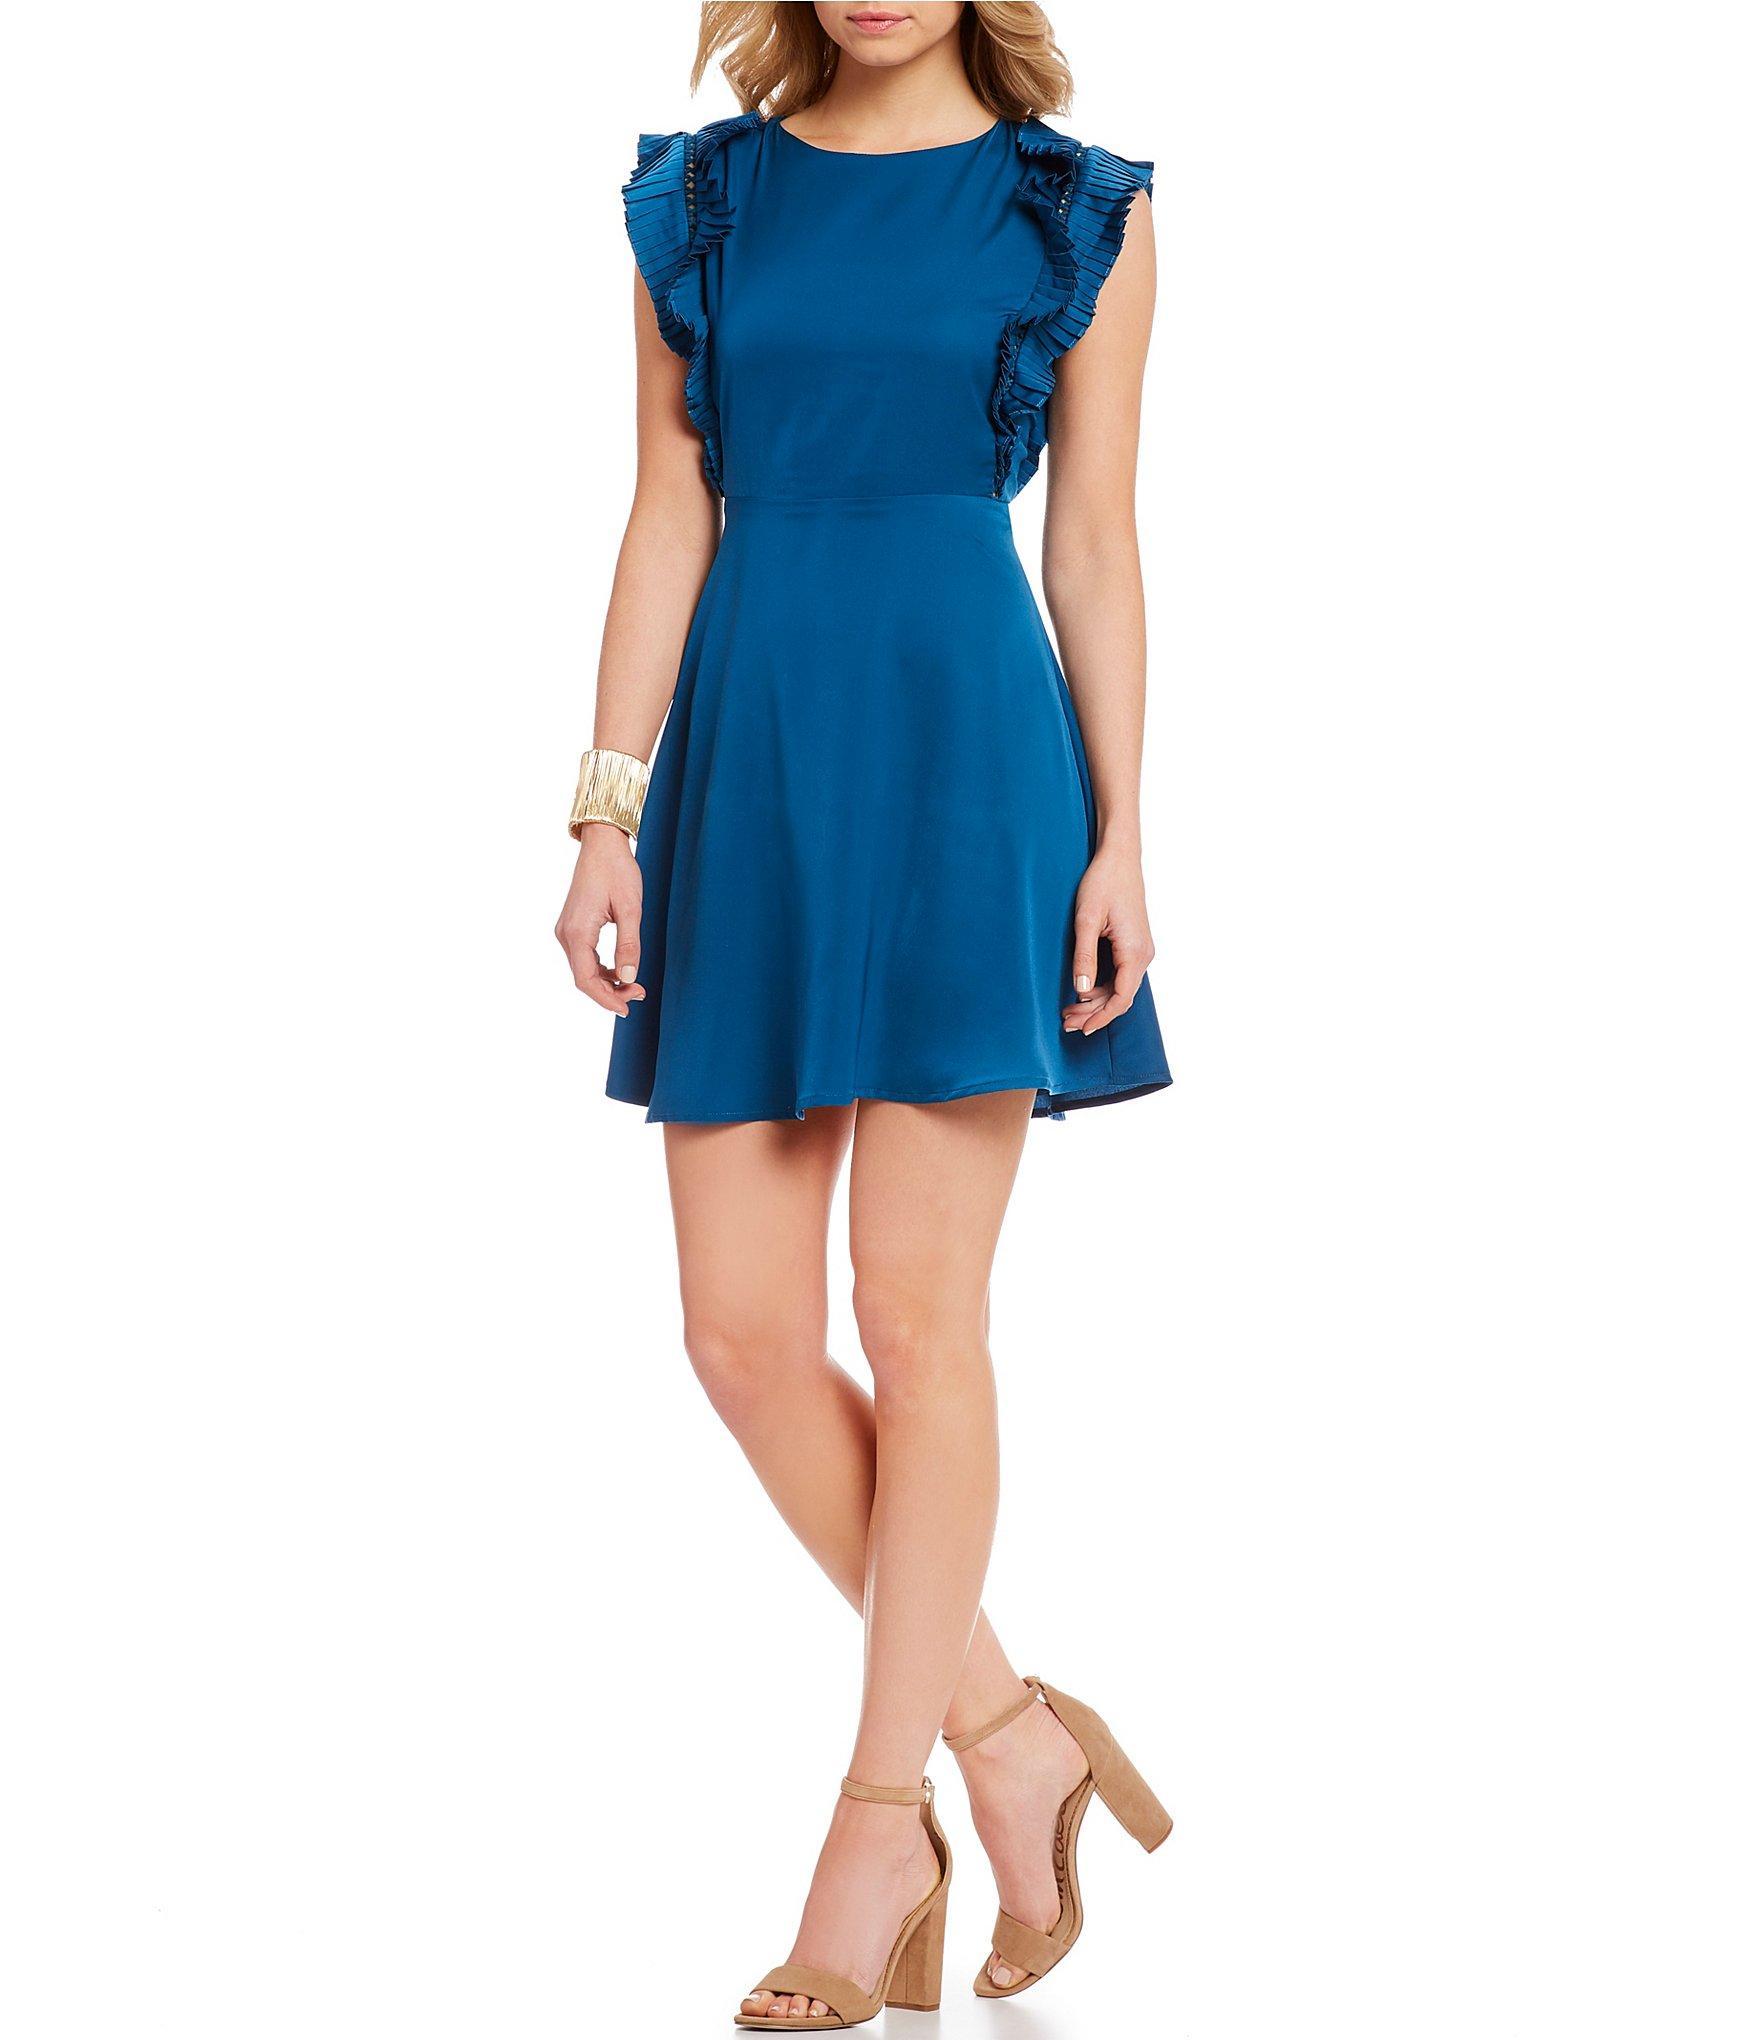 c660e85df3 Lyst - Sugarlips Ruffle Shoulder A-line Dress in Blue